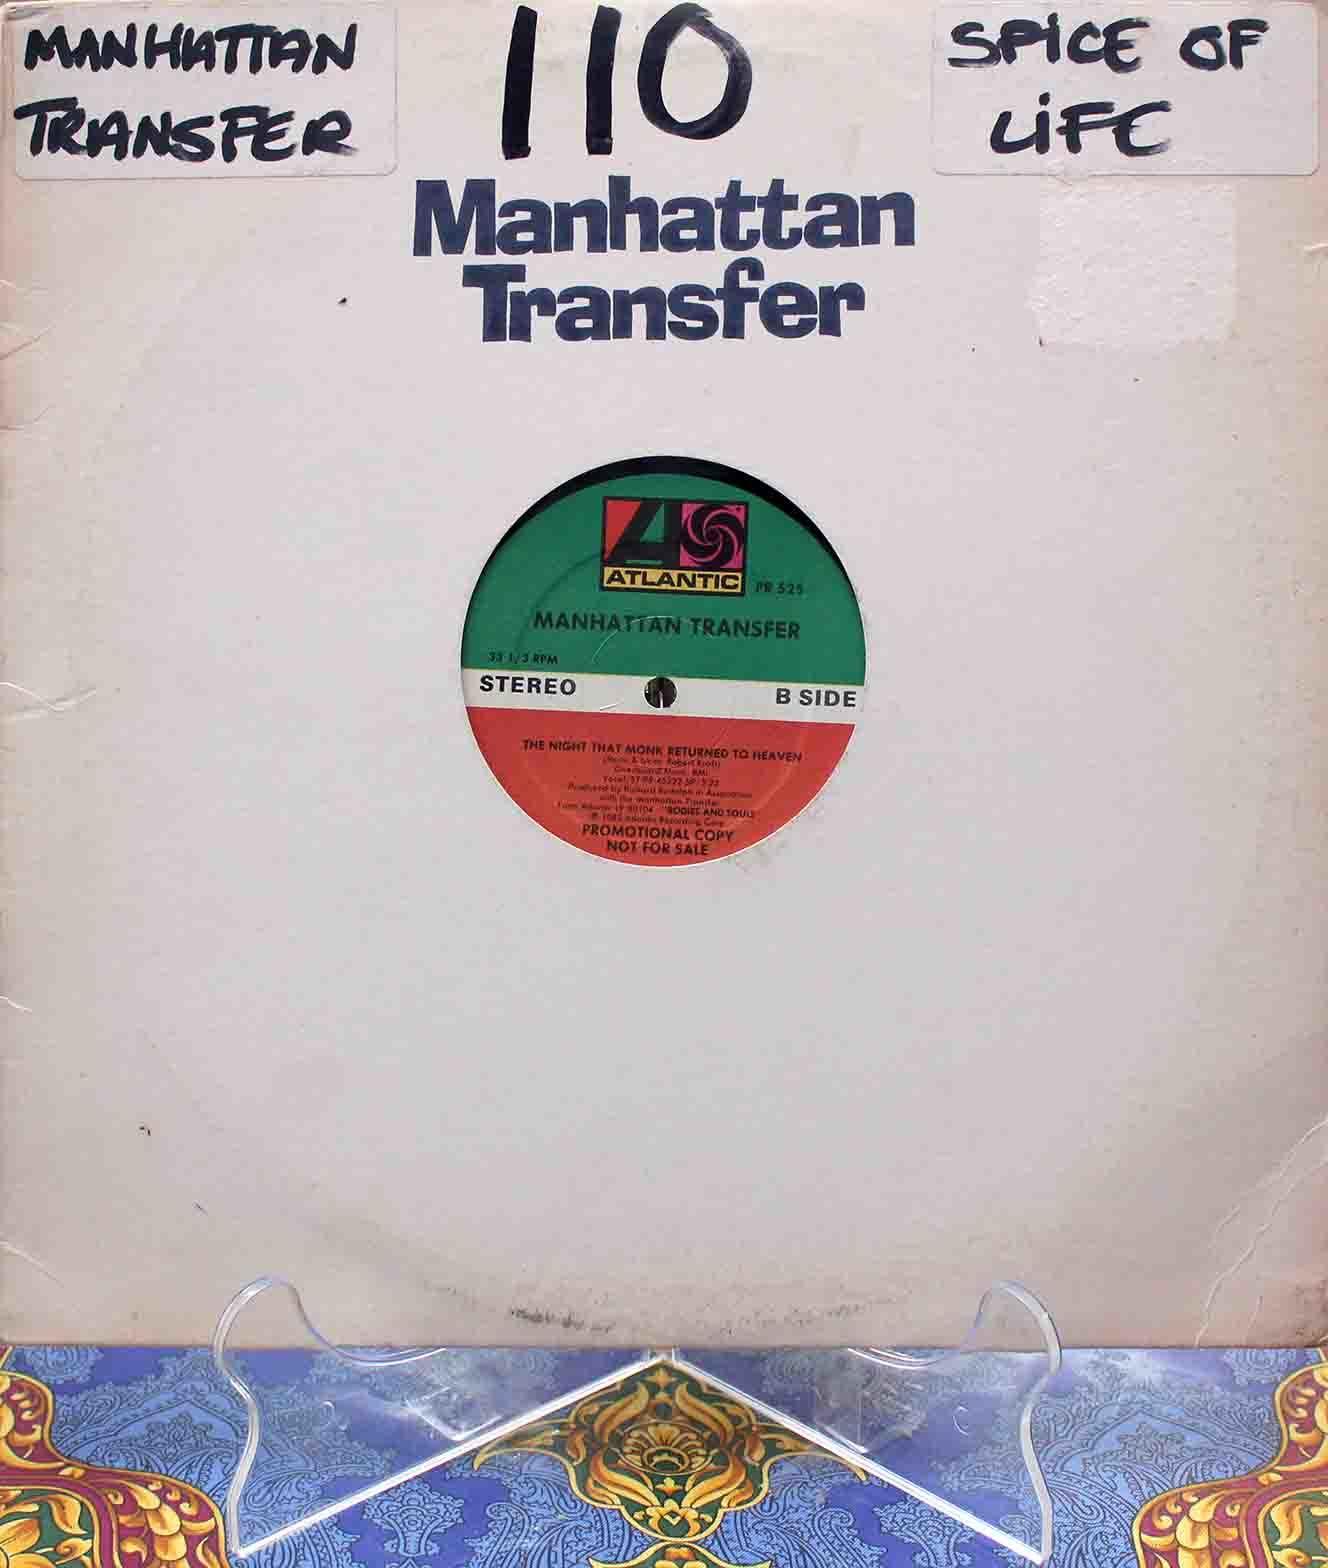 Manhattan Transfer Spice Of Life 02